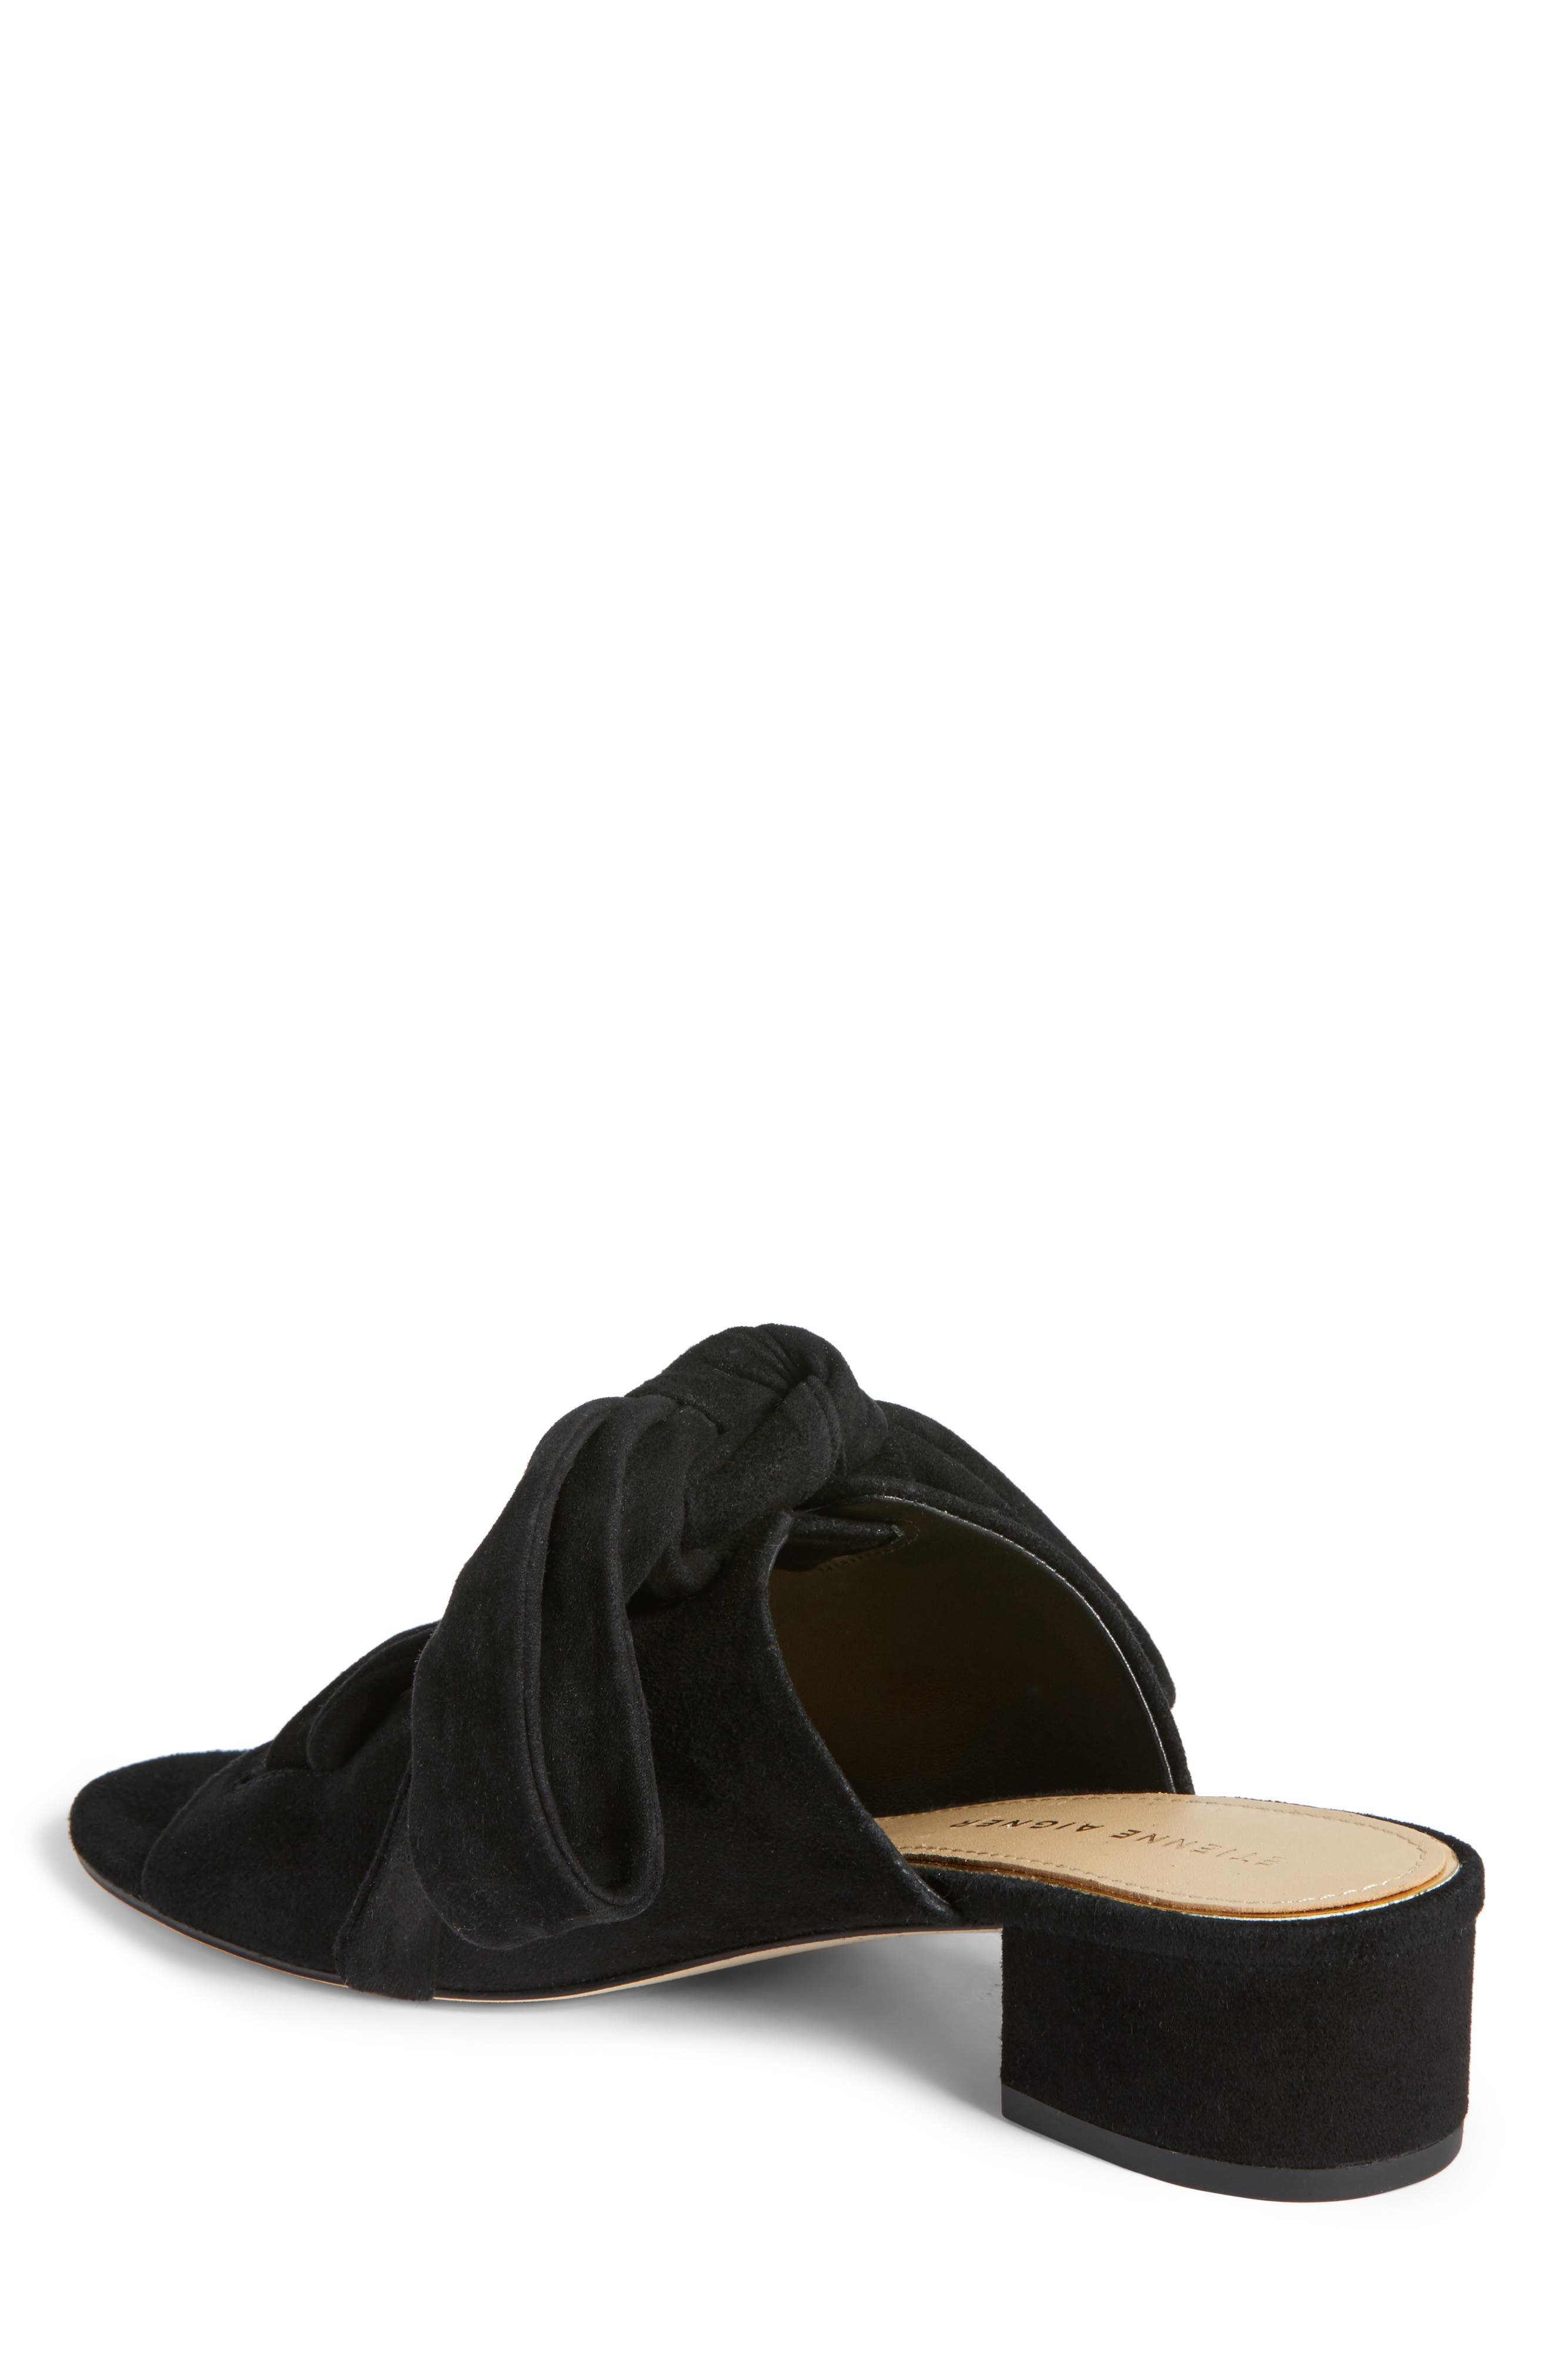 Bermuda Sandal,                             Alternate thumbnail 2, color,                             Black Suede